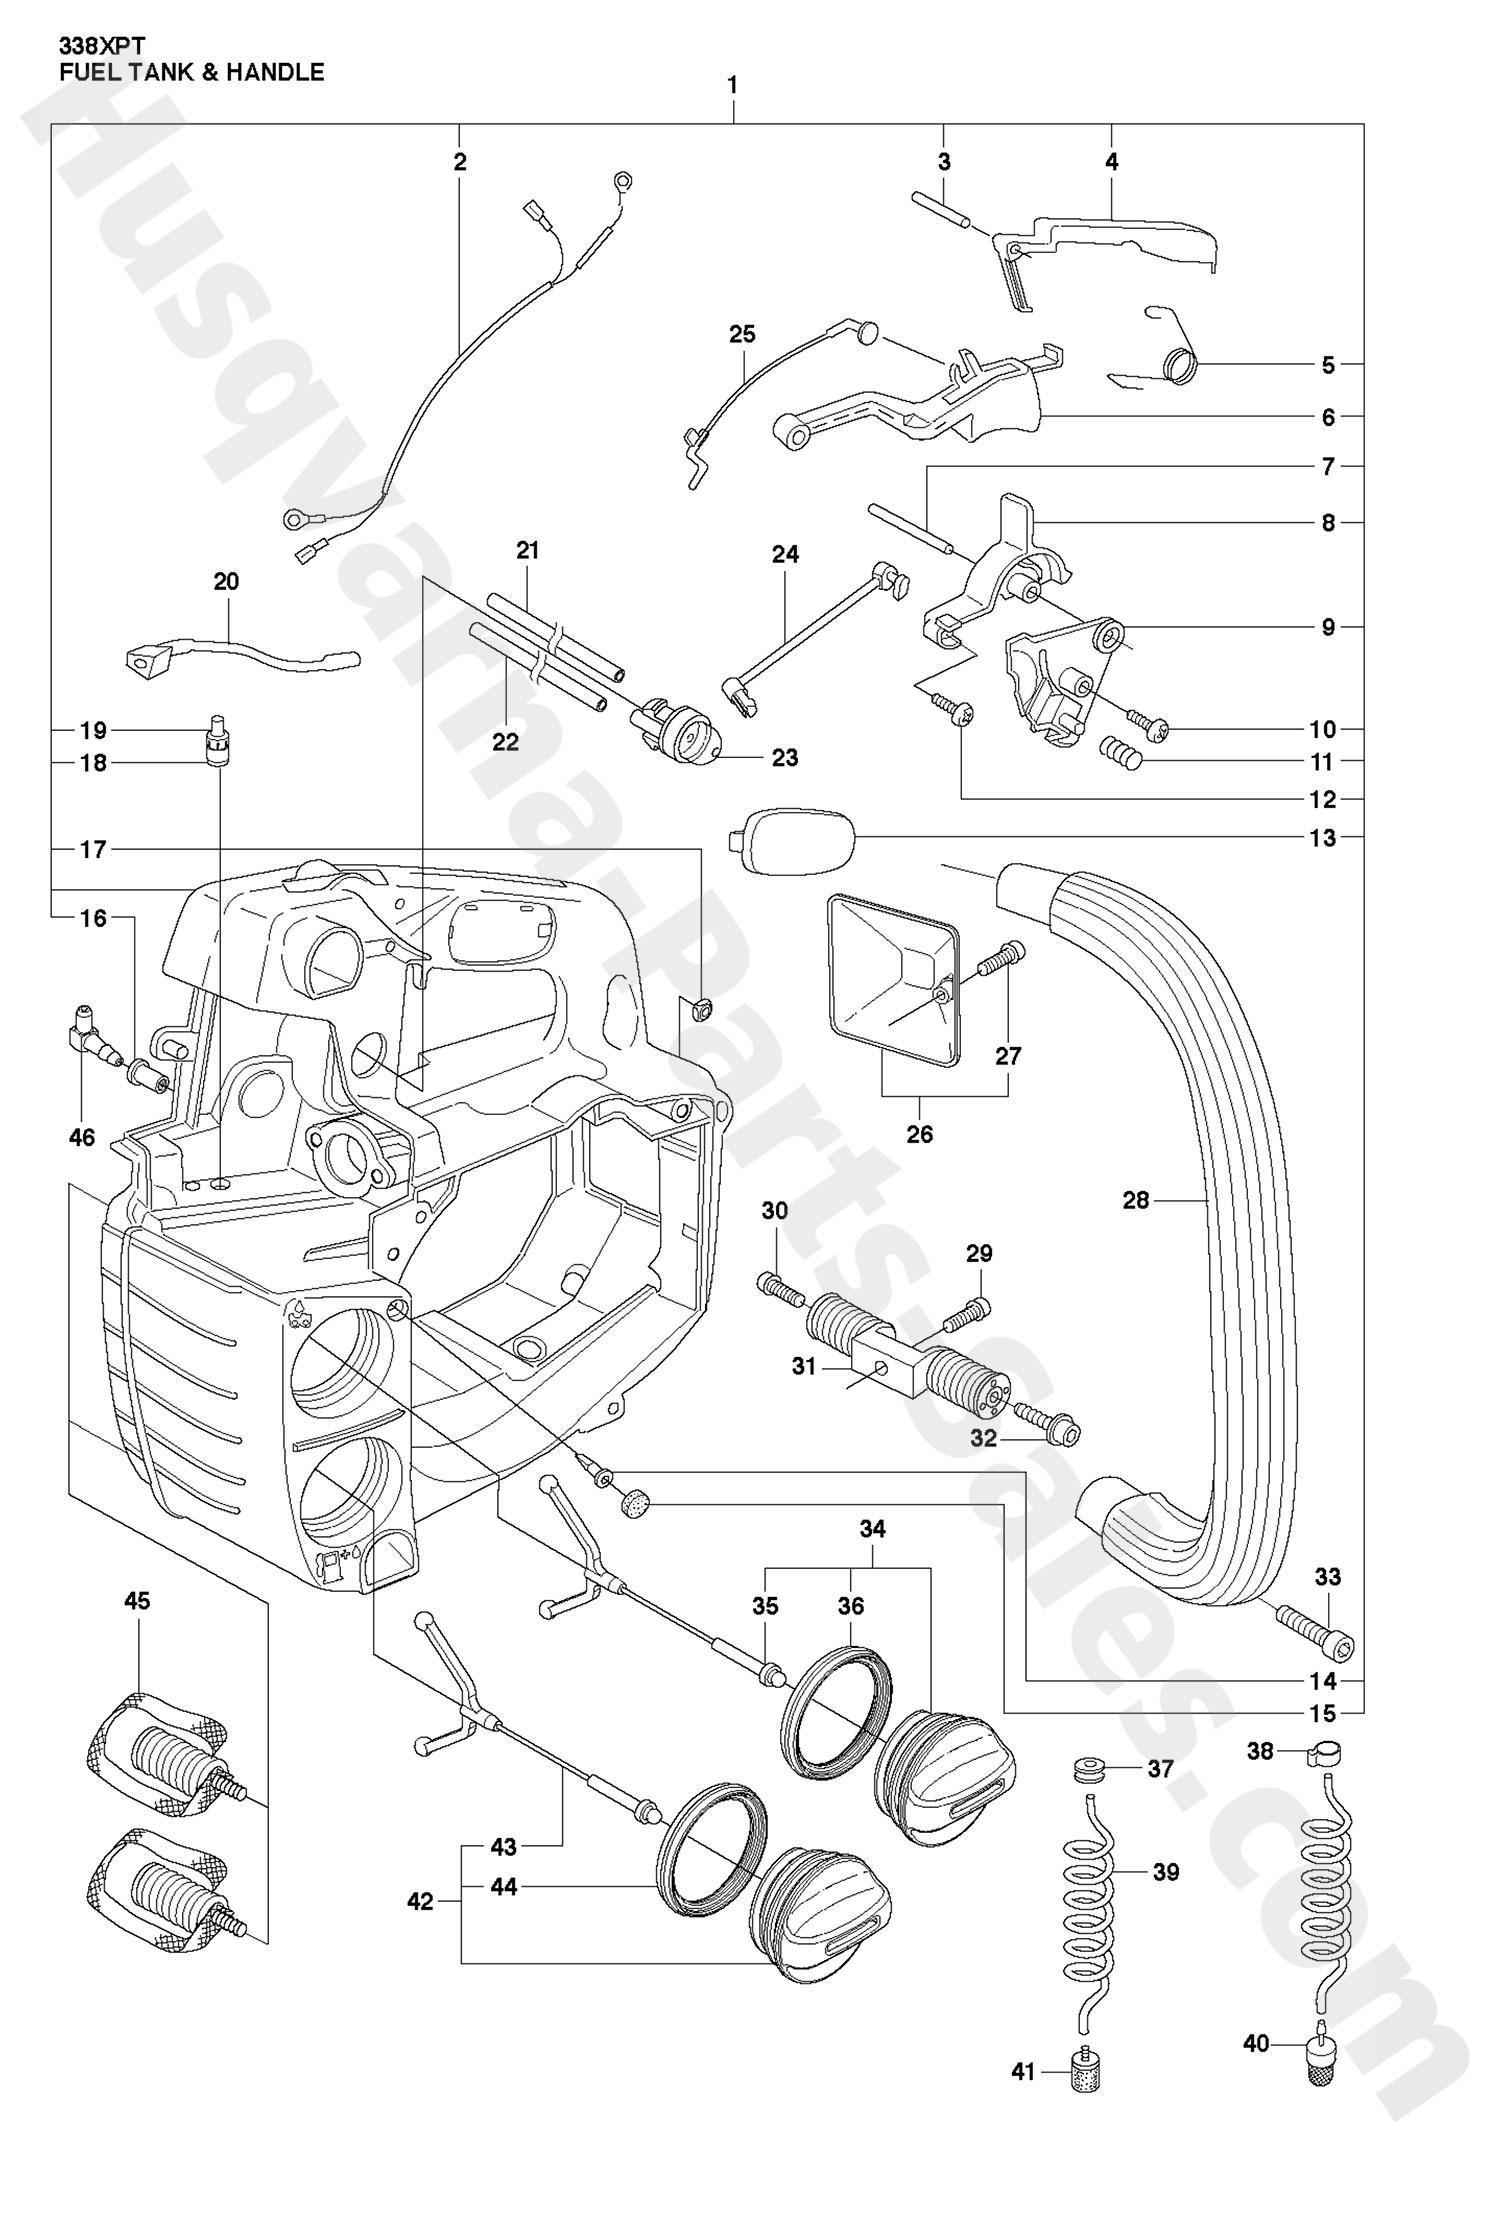 338xpt Husqvarna Professional Chain Saw Fuel Tank Amp Handle